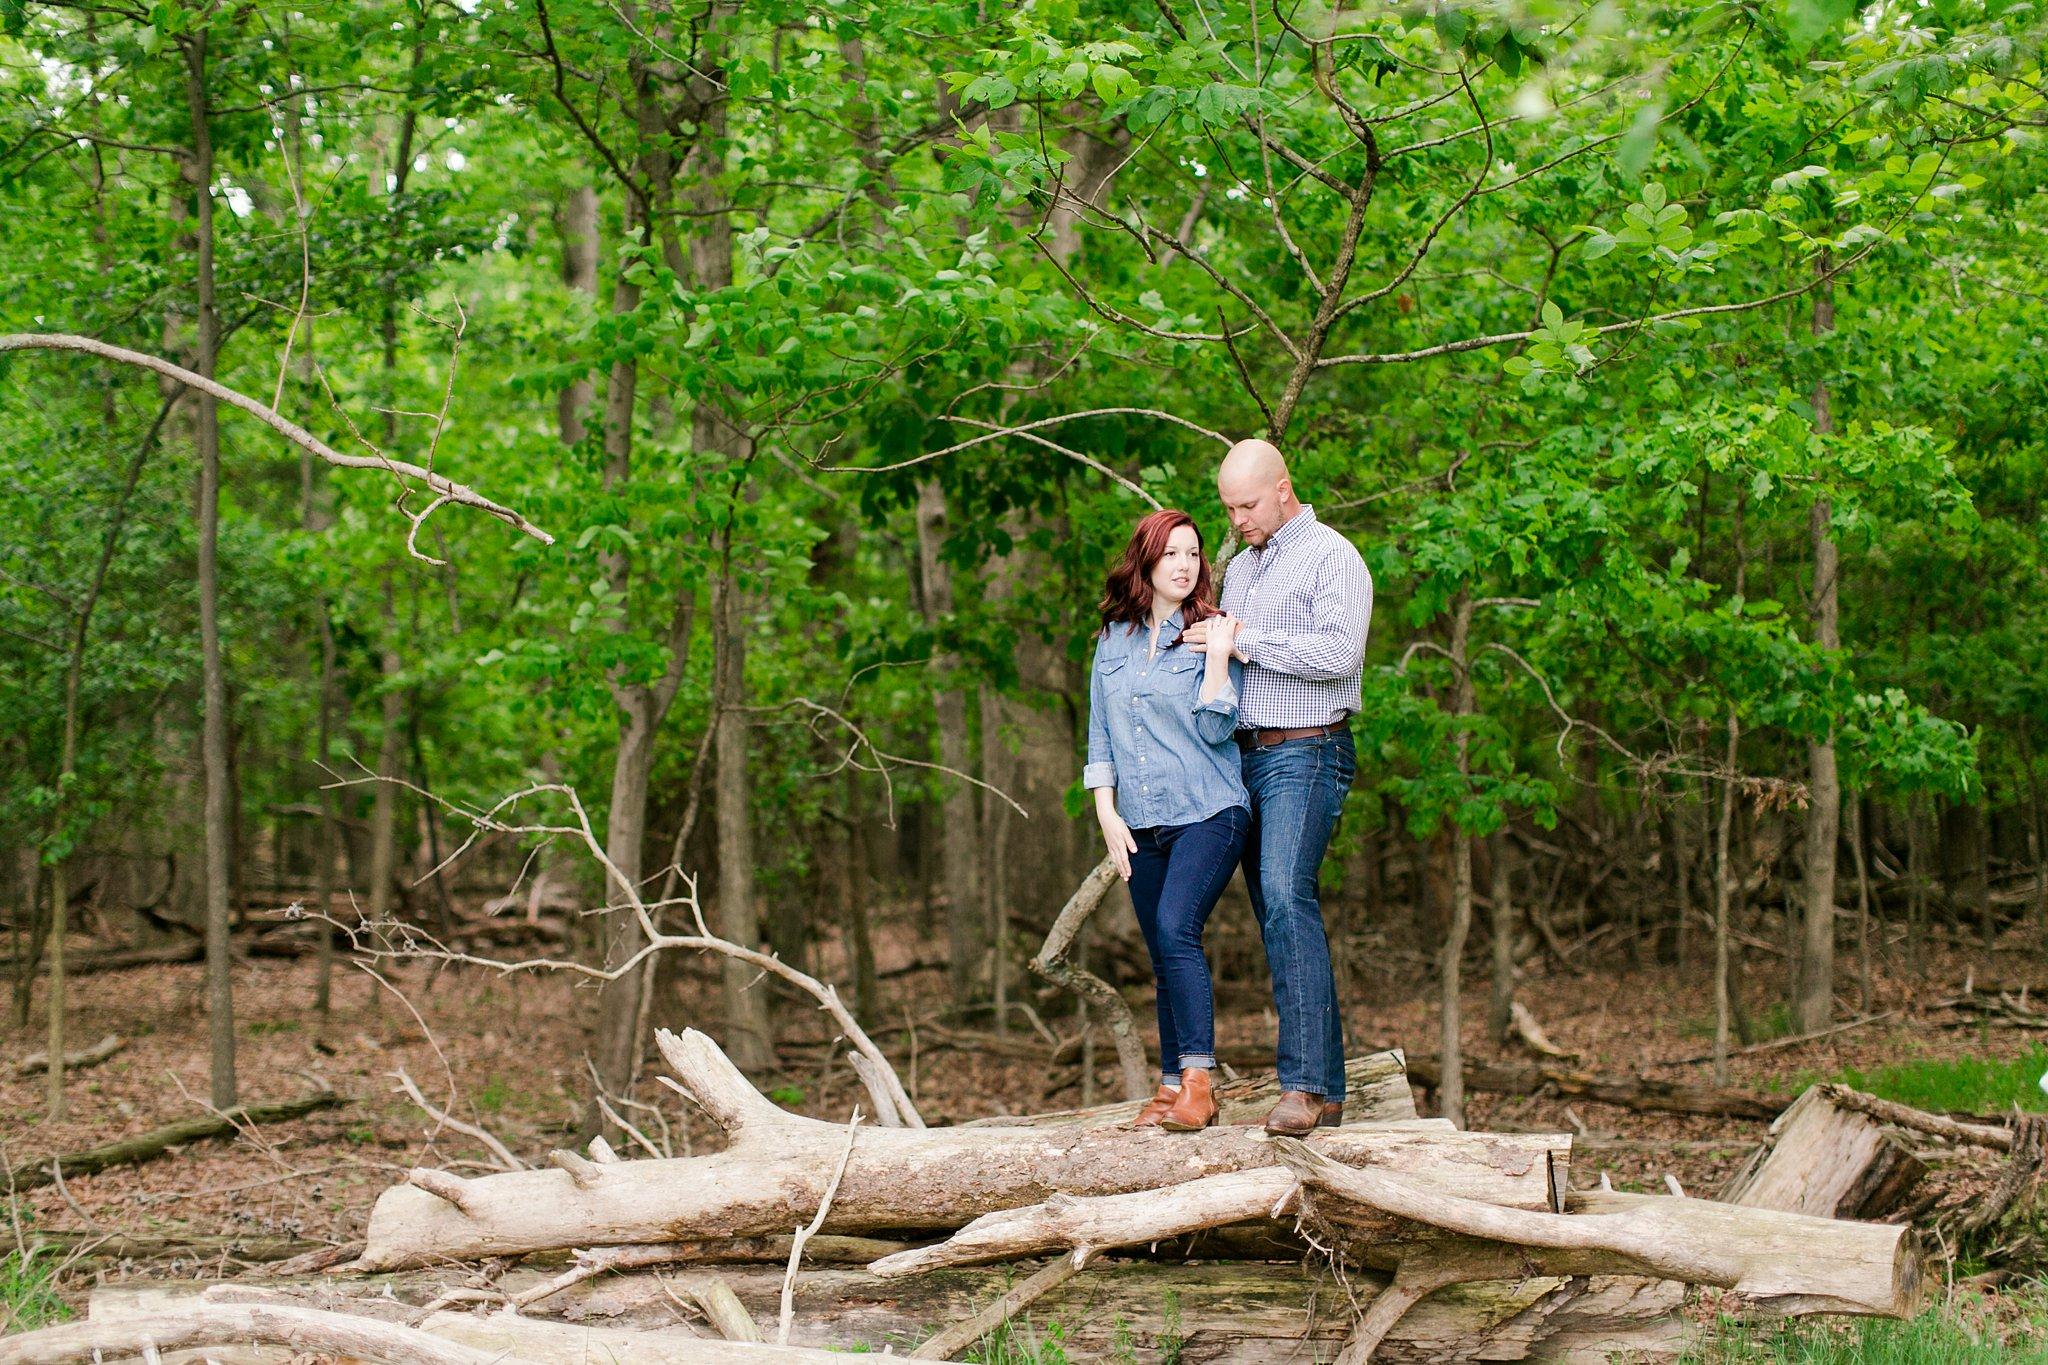 Old Town Manassas Battlefield Engagement Photos Virginia Wedding Photographer Jessica & Jason-152.jpg